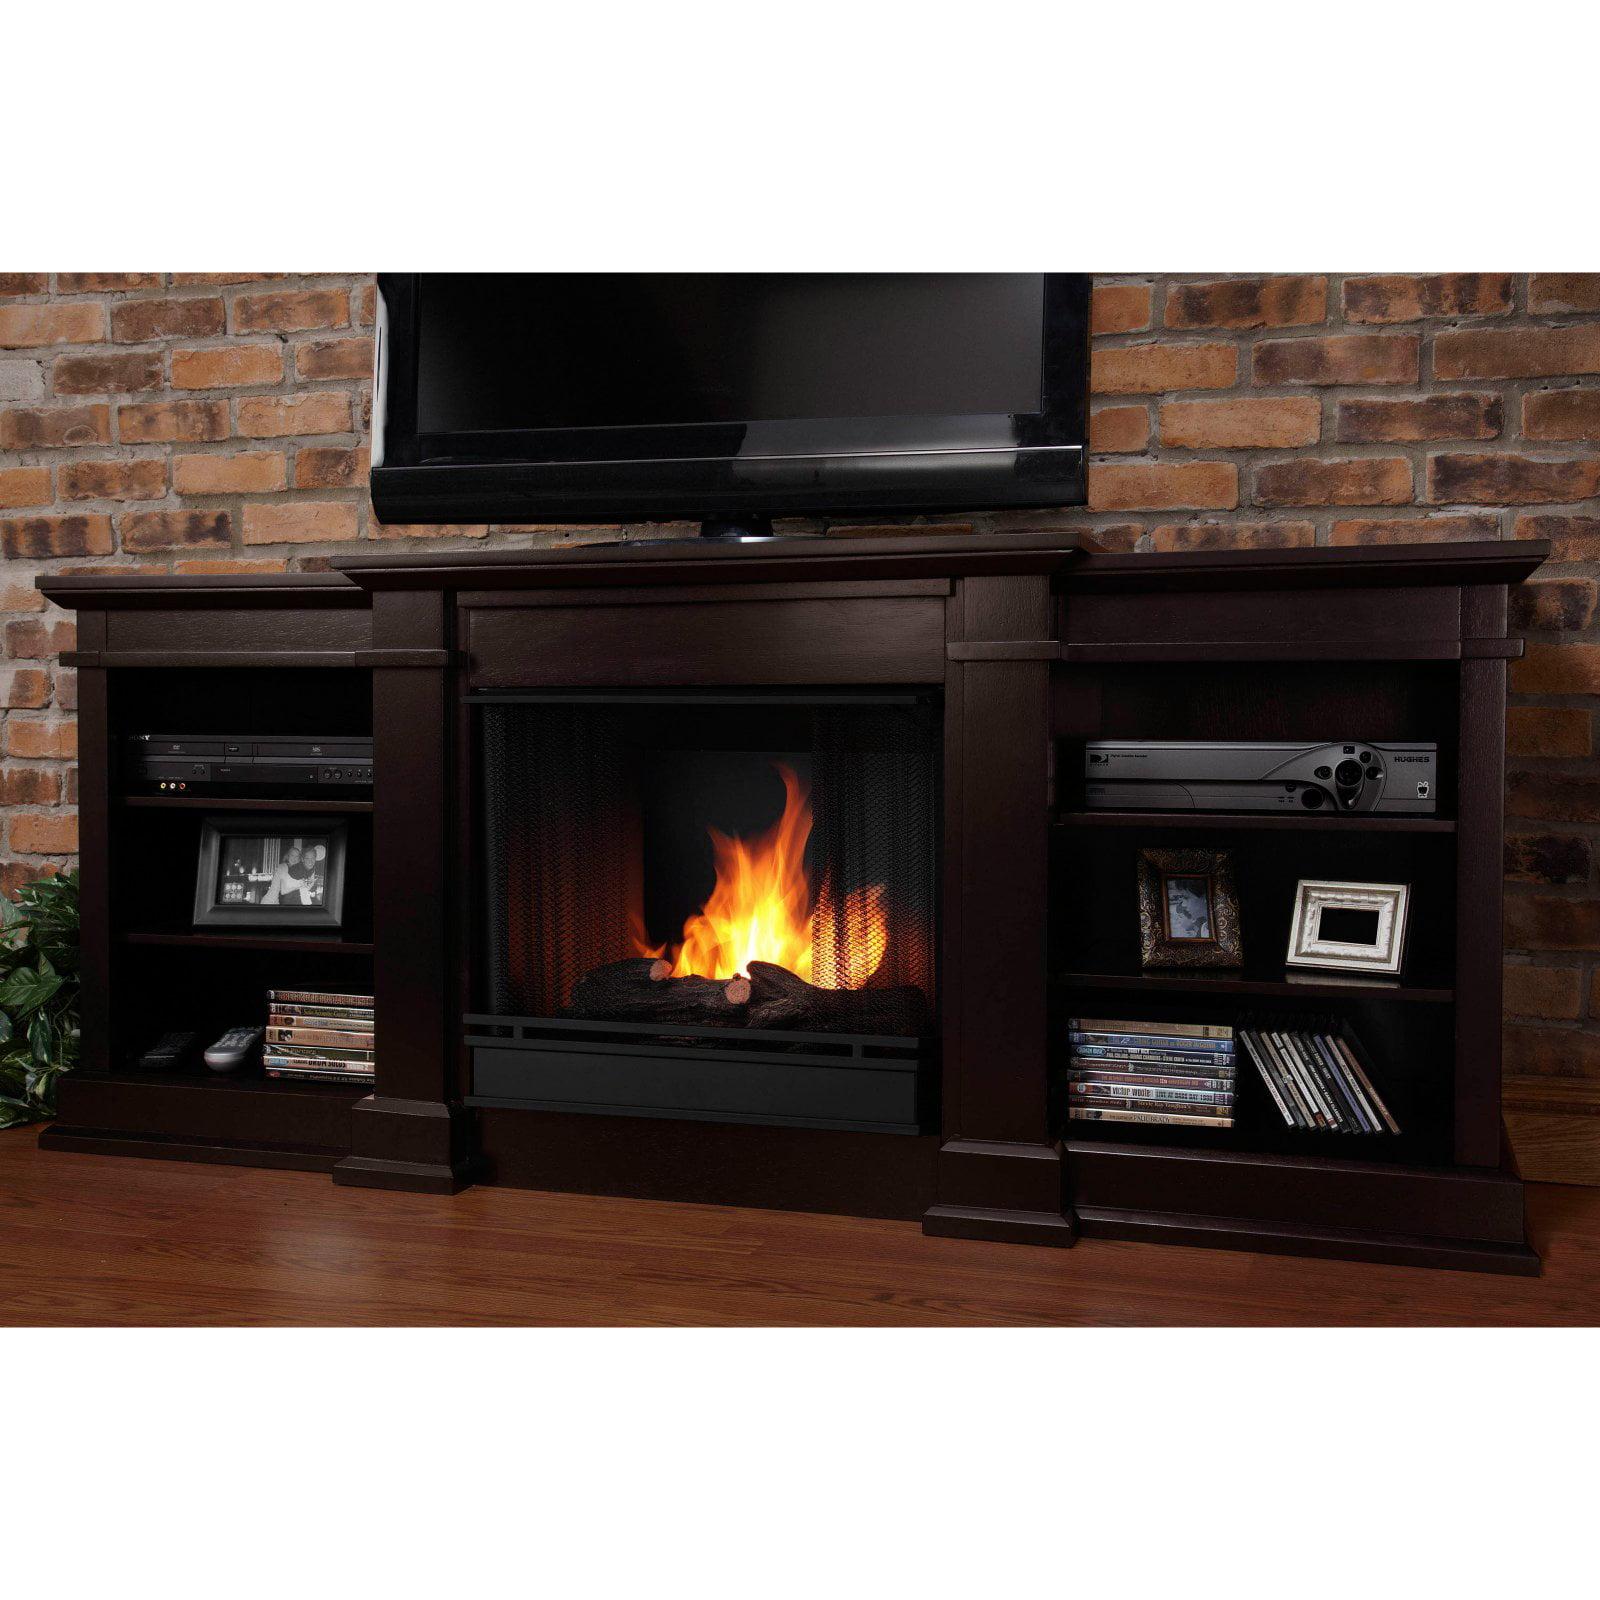 Real Flame Fresno Ventless Gel Fireplace - Dark Walnut